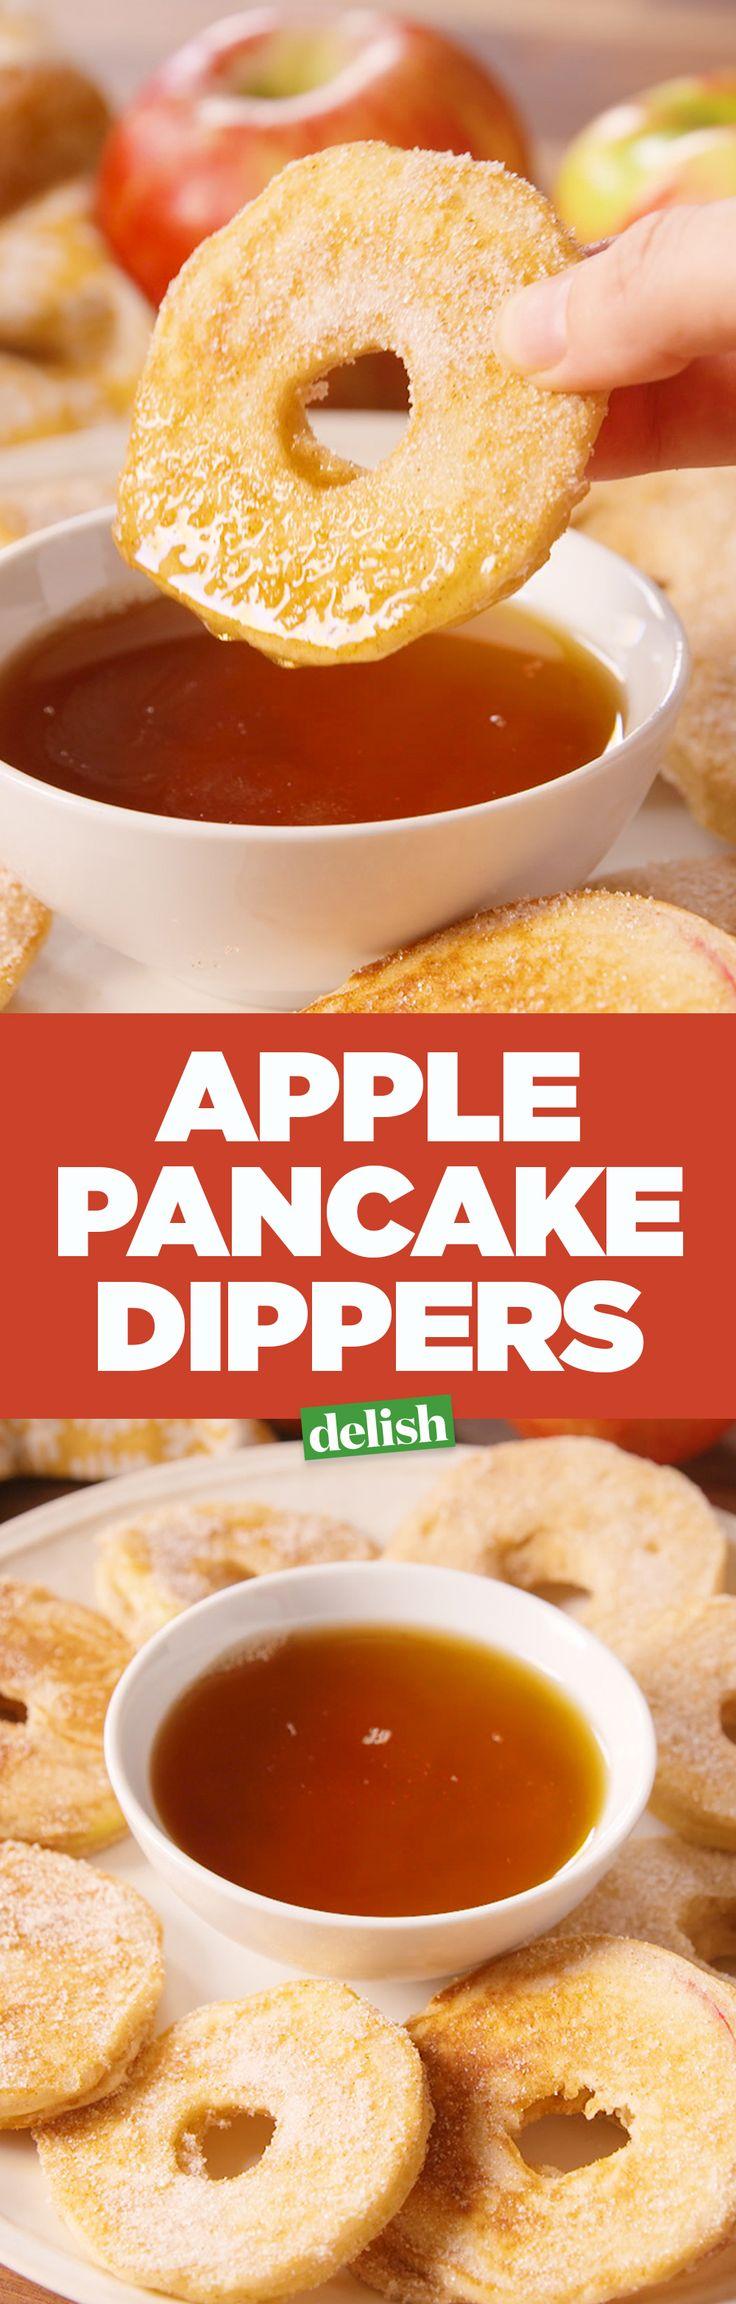 Apple pancake dippers = GENIUS! Get the recipe on Delish.com.